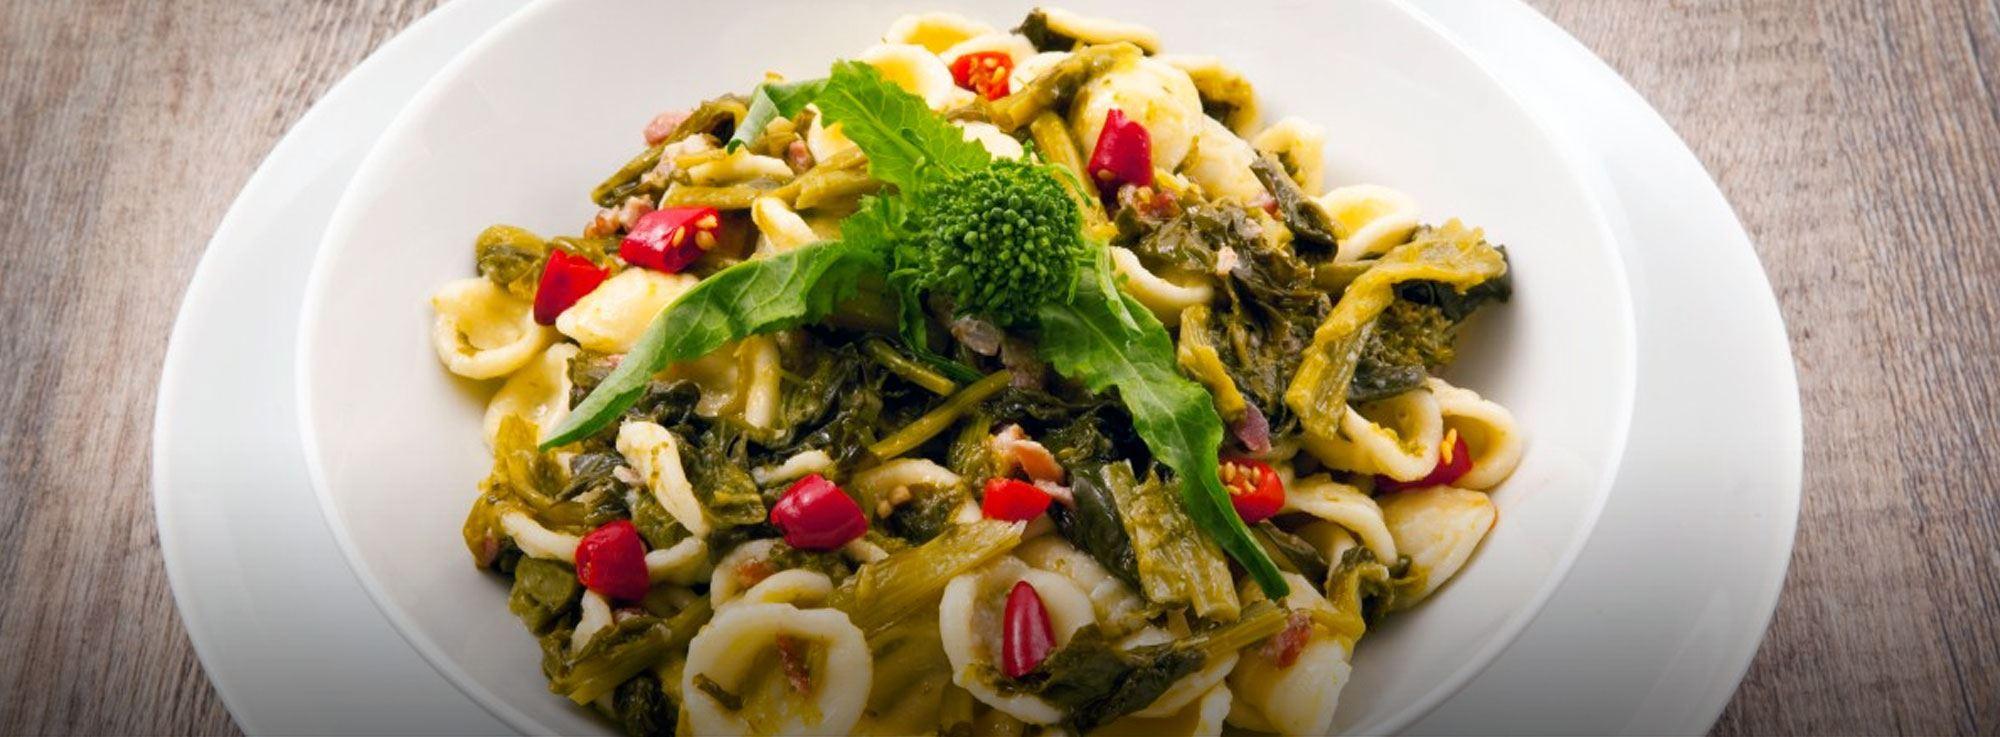 cucina pugliese tra sapori tradizioni e profumi tipici